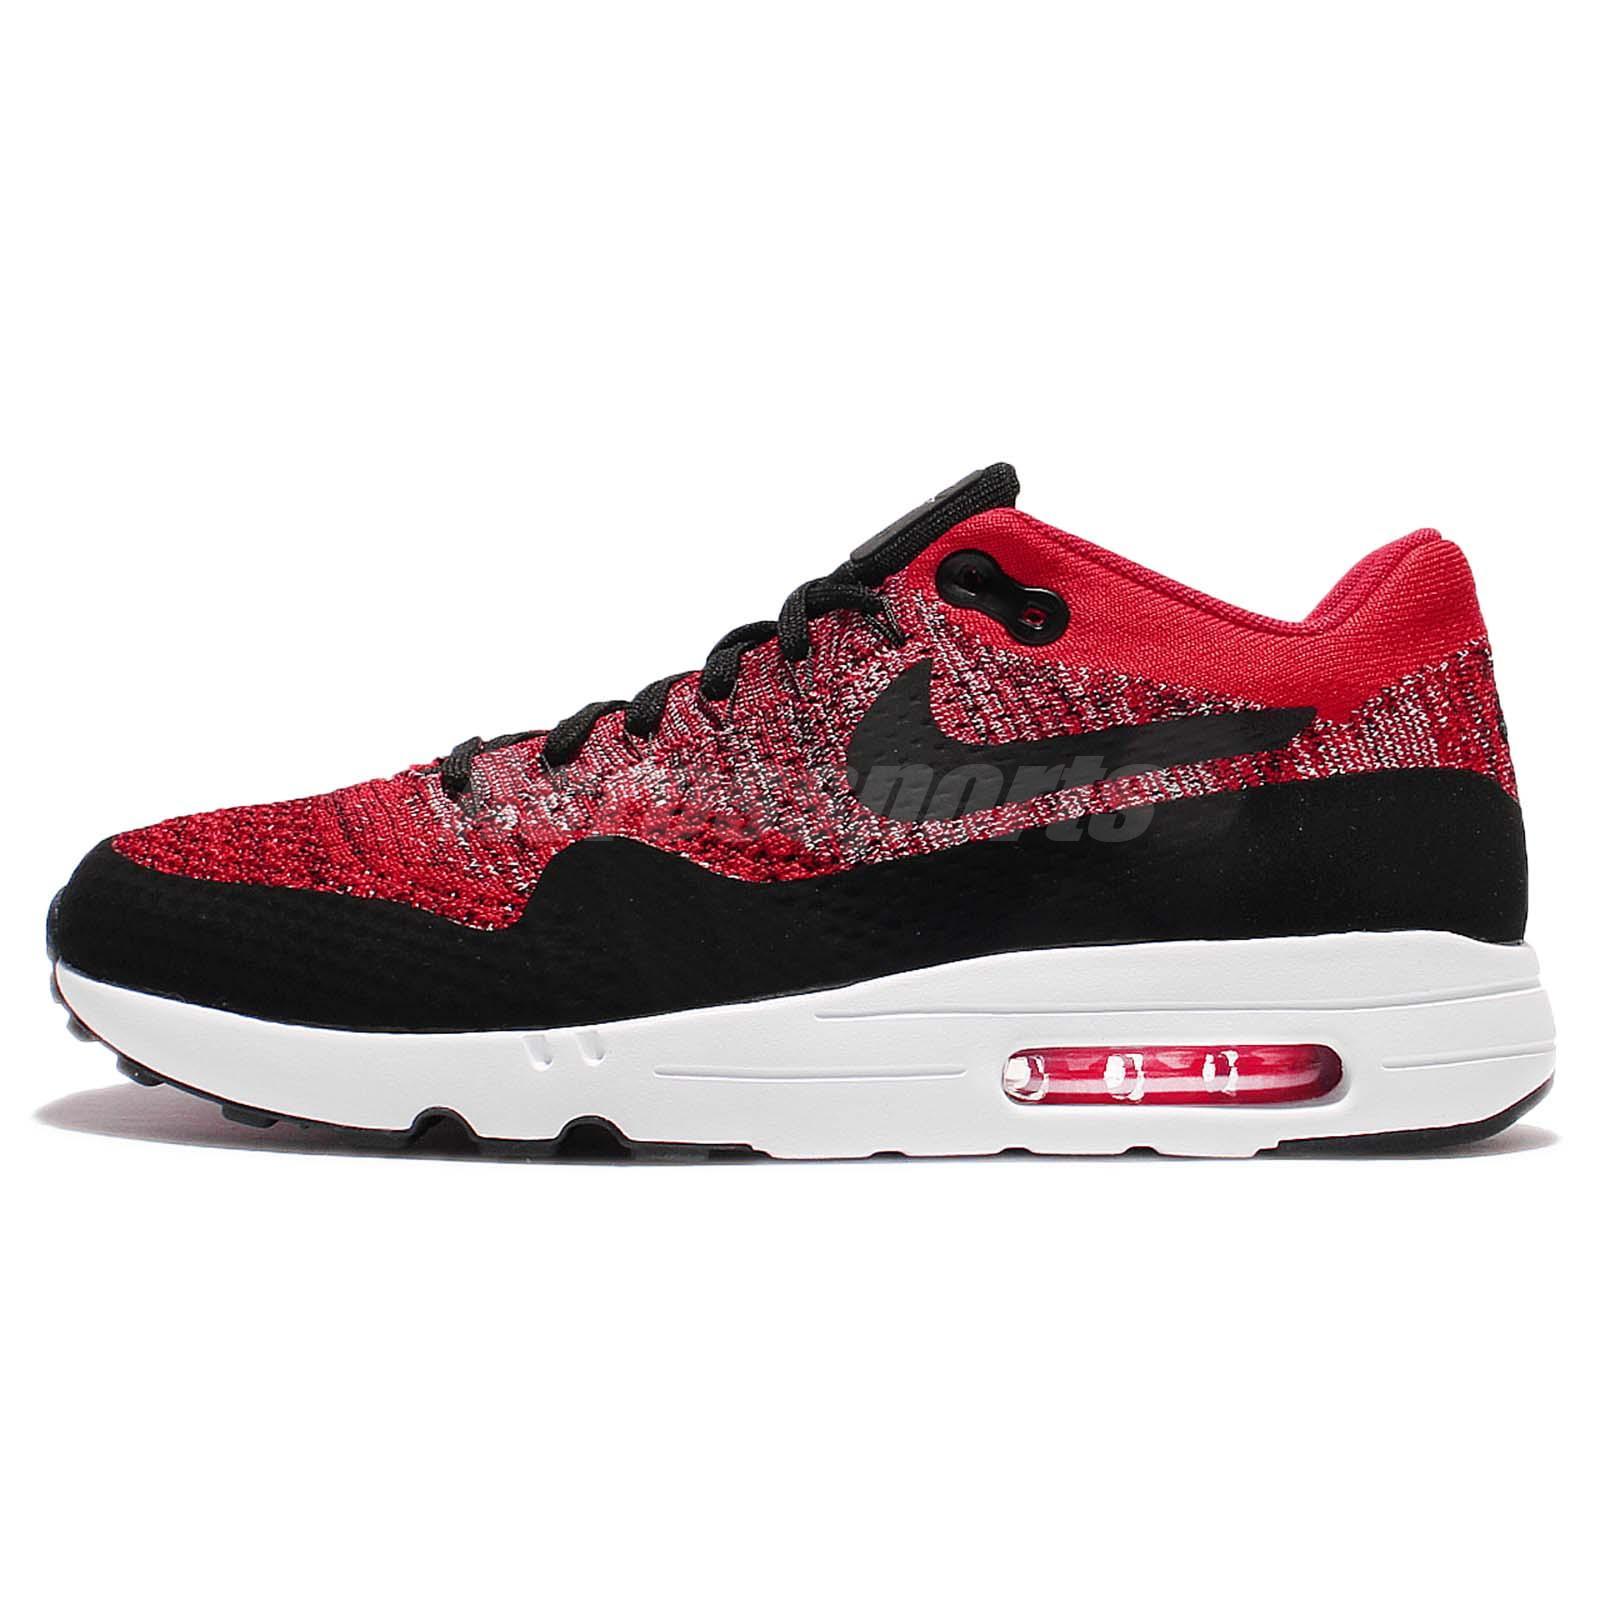 Nike Air Max 1 T Id leoncamier.co.uk